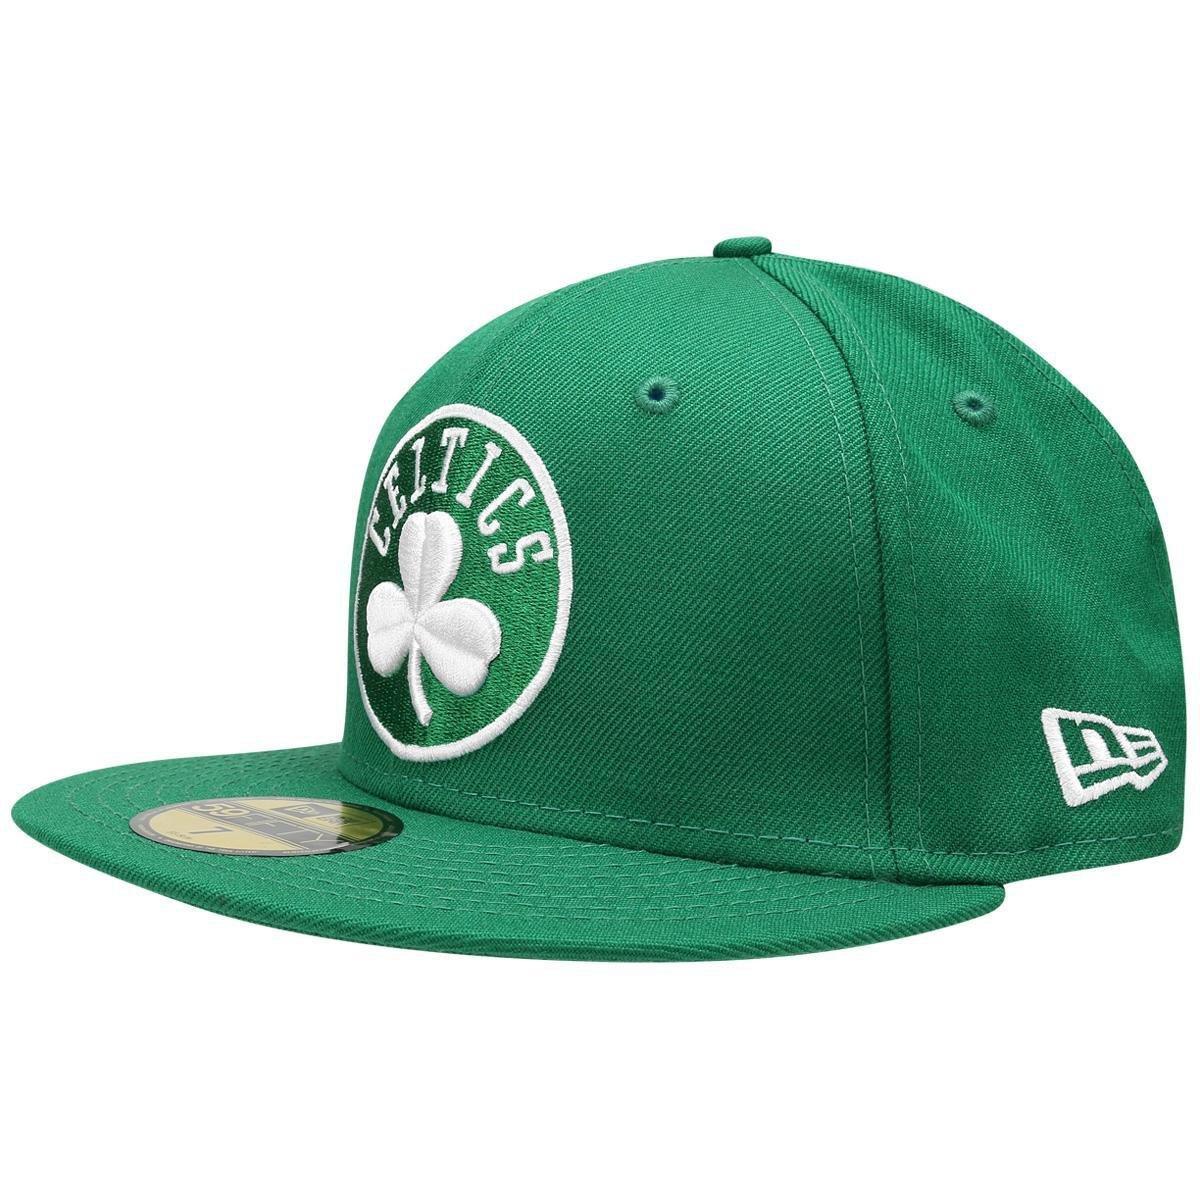 Boné New Era NBA 5950 Boston Celtics - Compre Agora  ec82da00800